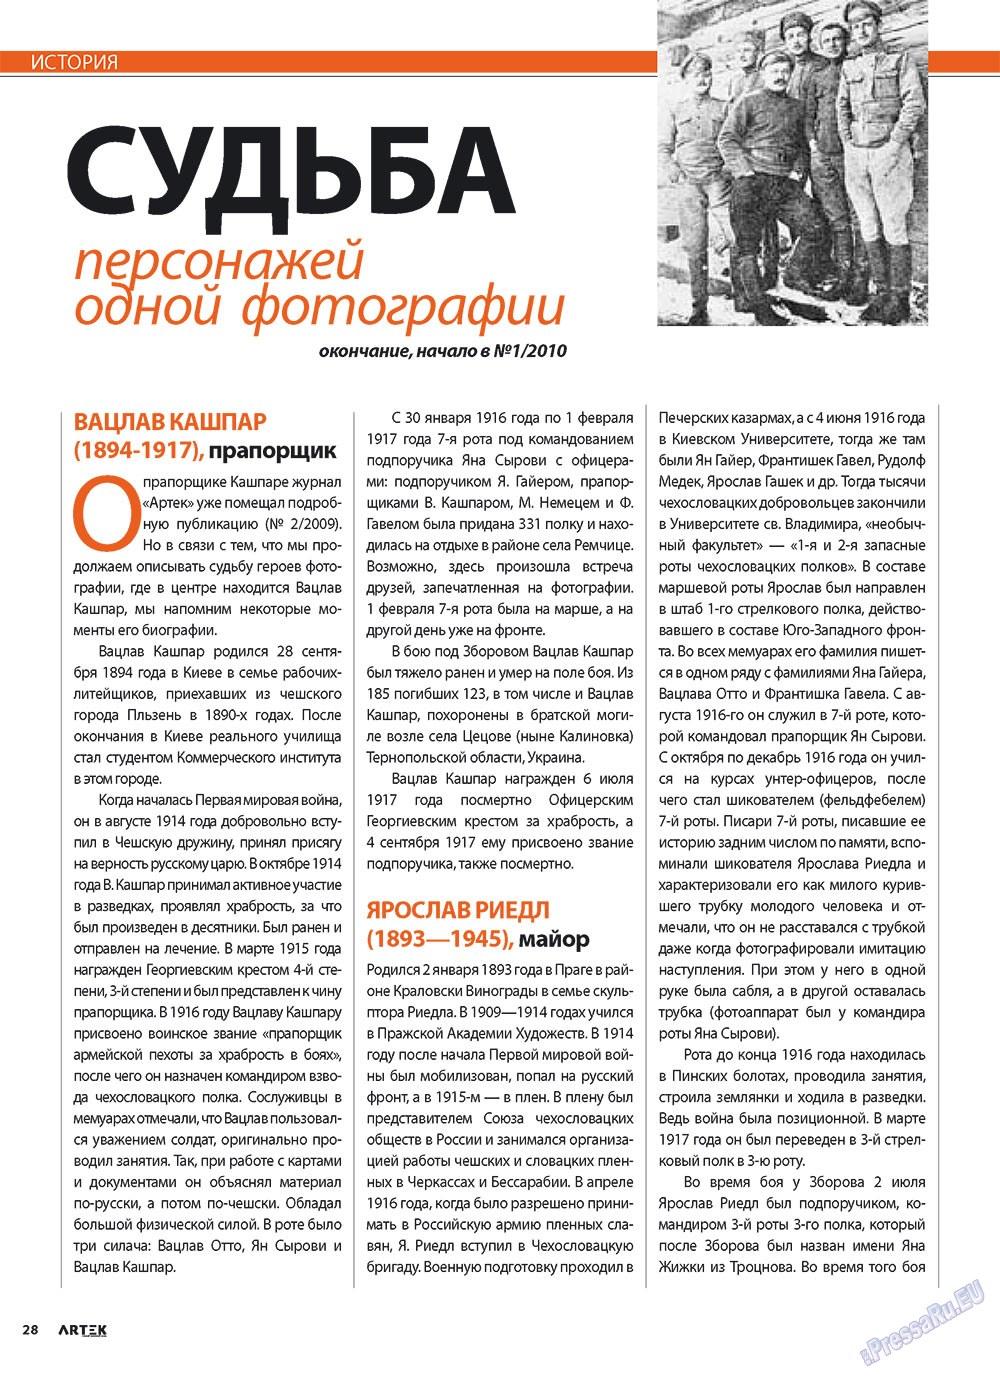 Артек (журнал). 2010 год, номер 2, стр. 30